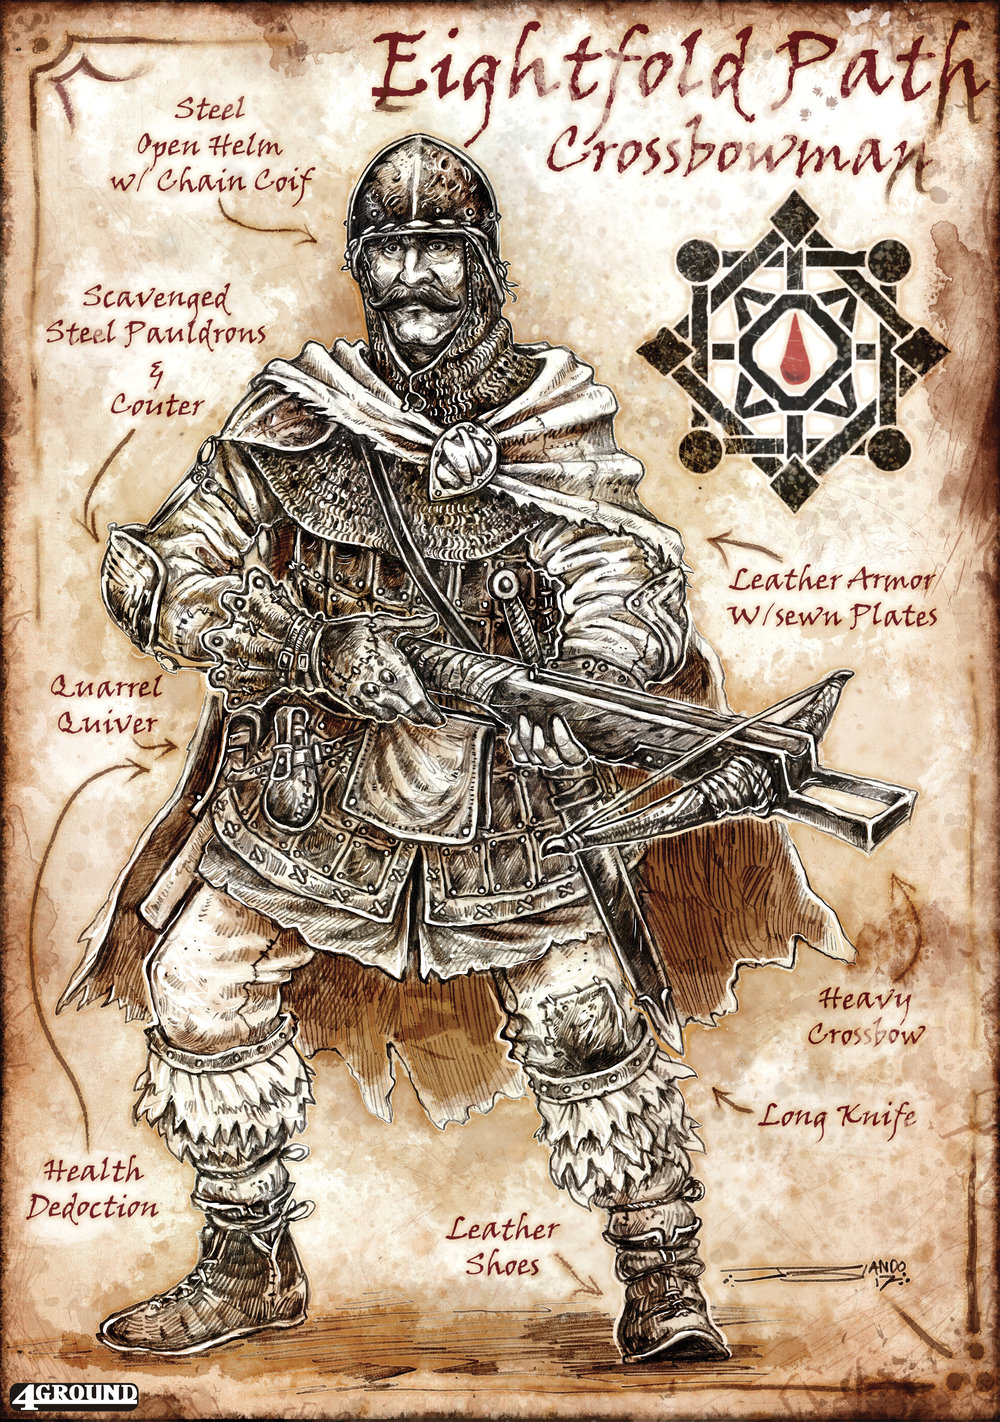 Eightfold Path Faction : Crossbowman